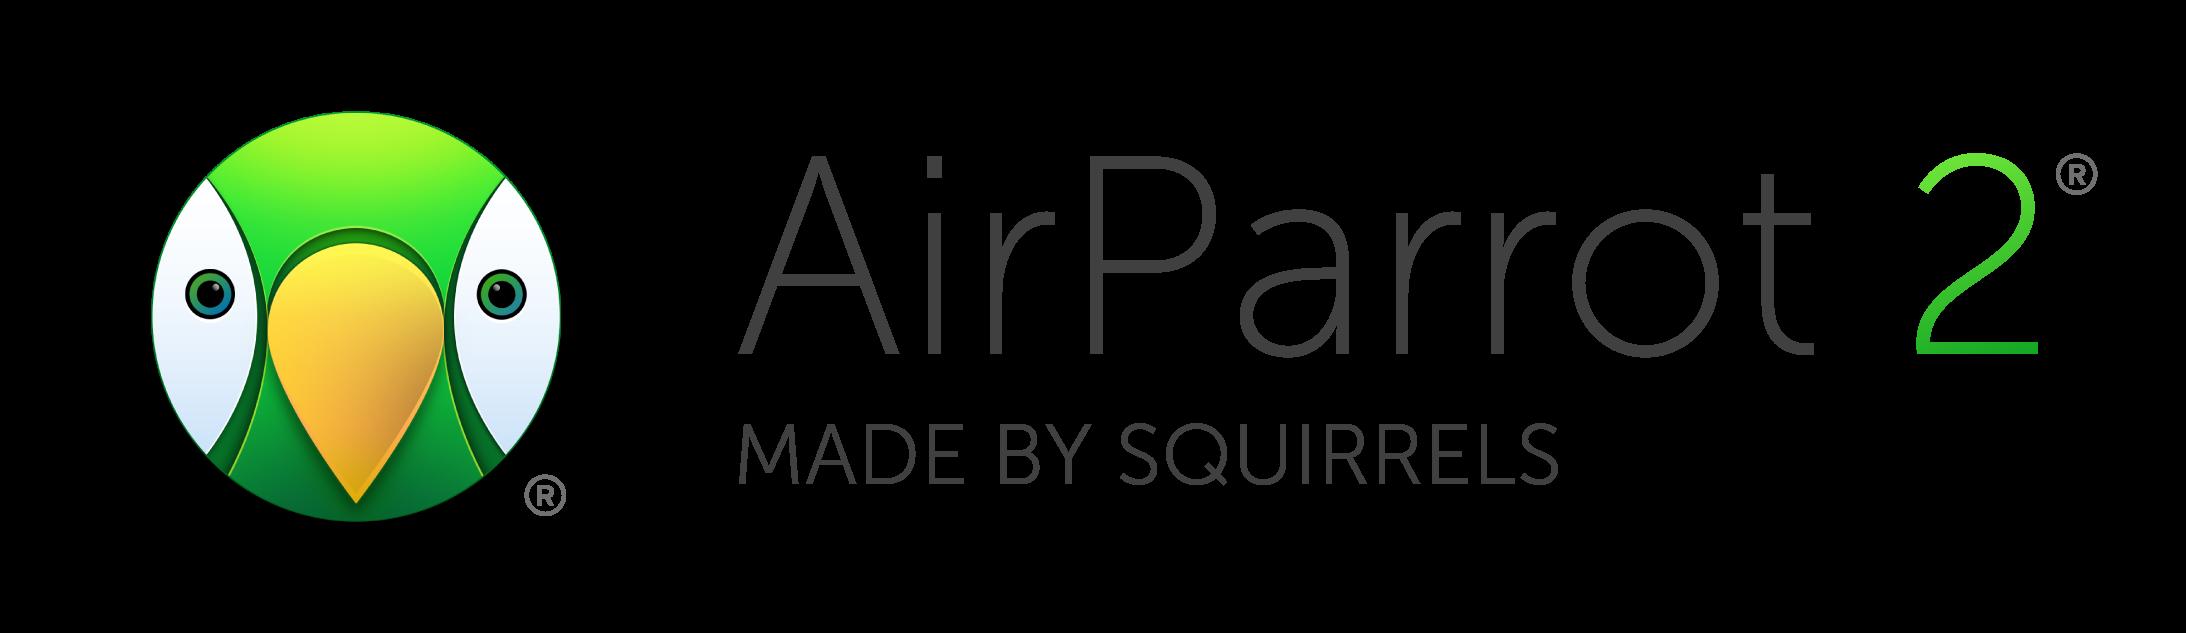 AirParrot Logo